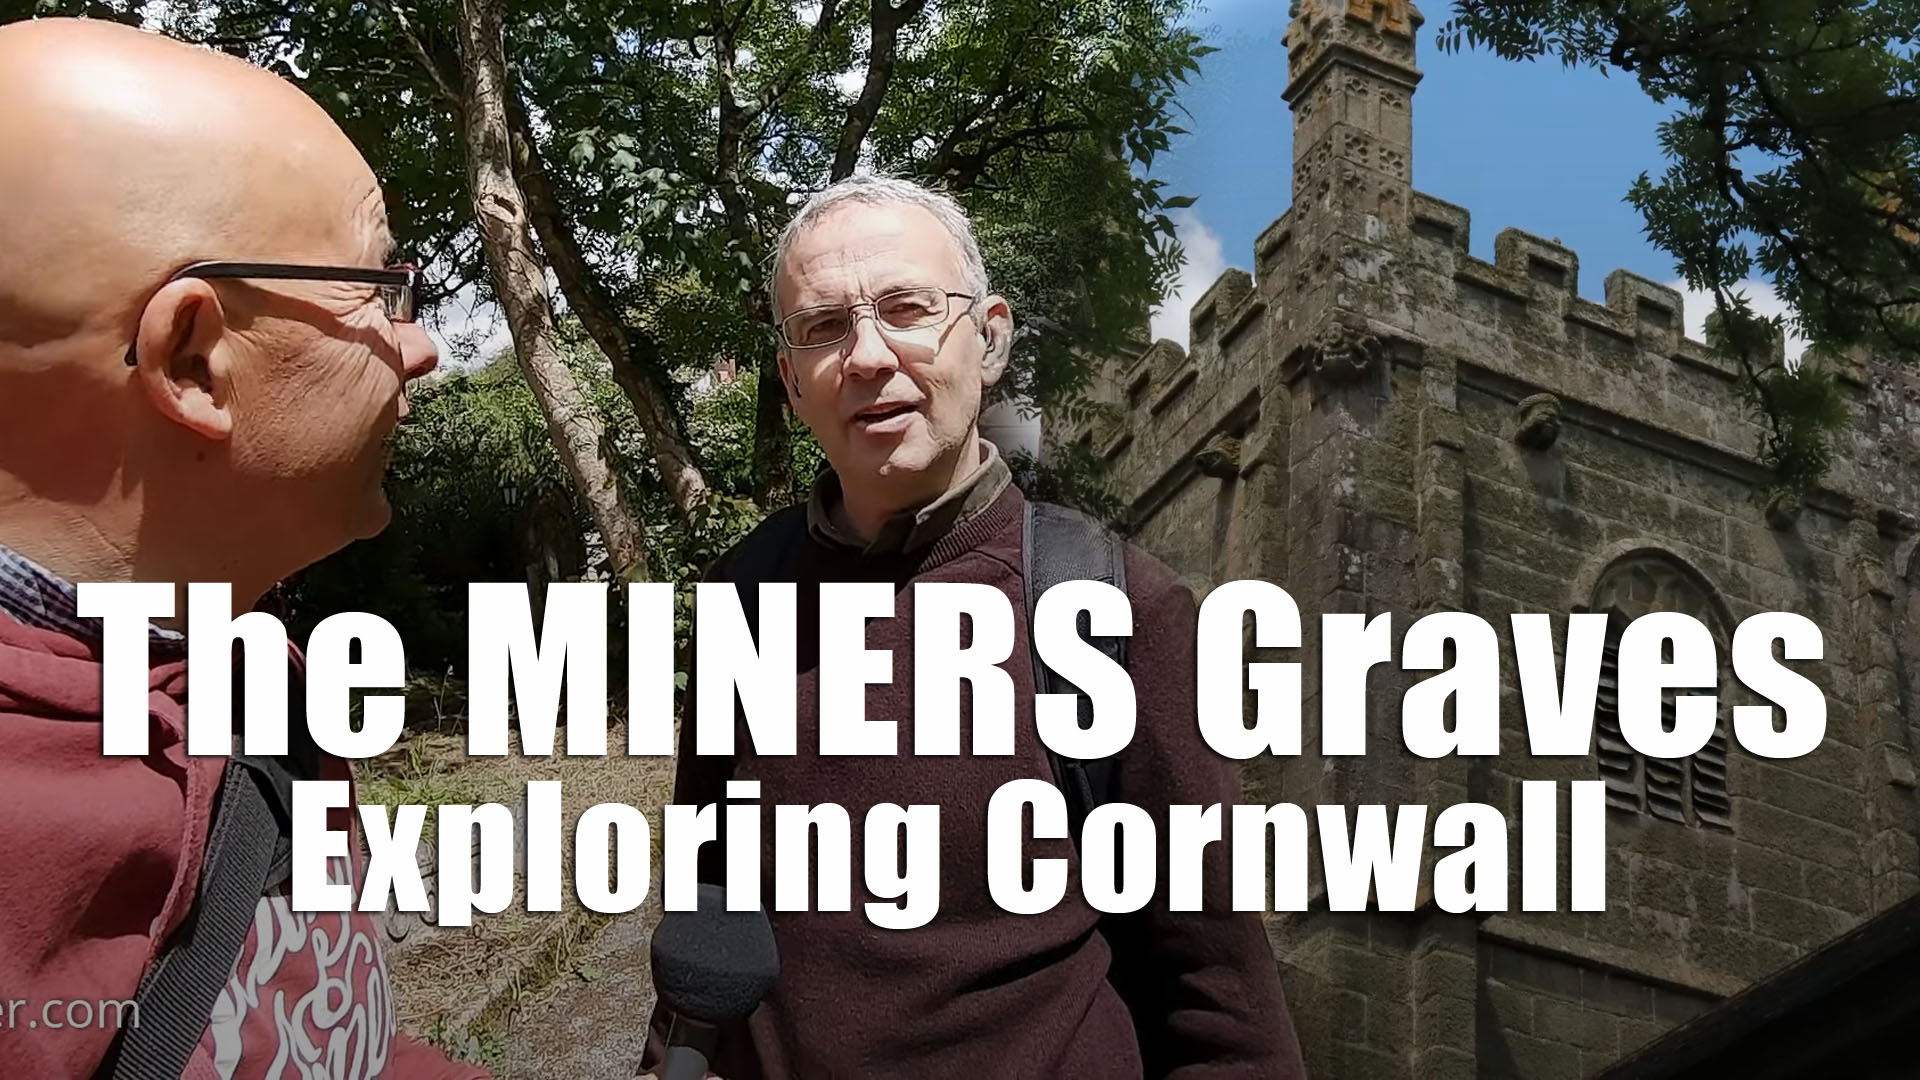 Exploring Cornwall - A Visit to St Euny Church